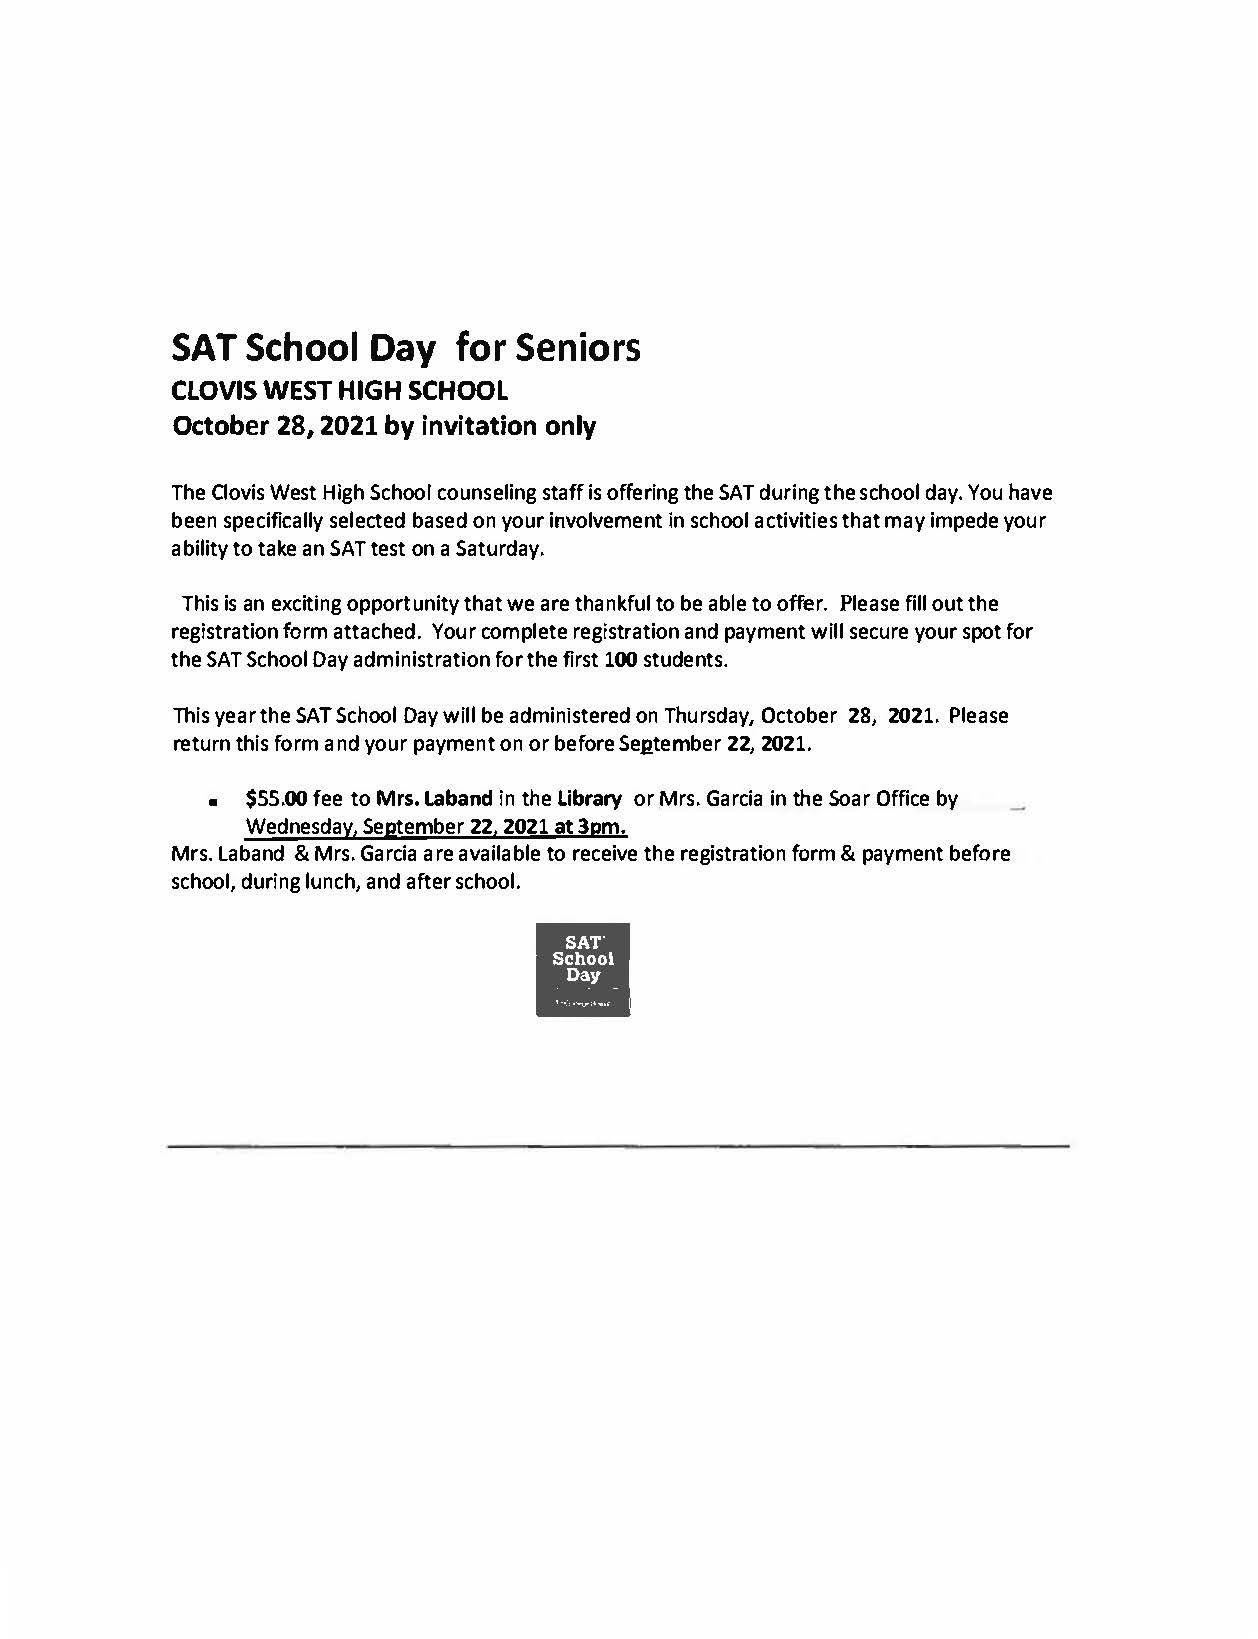 SAT flyer